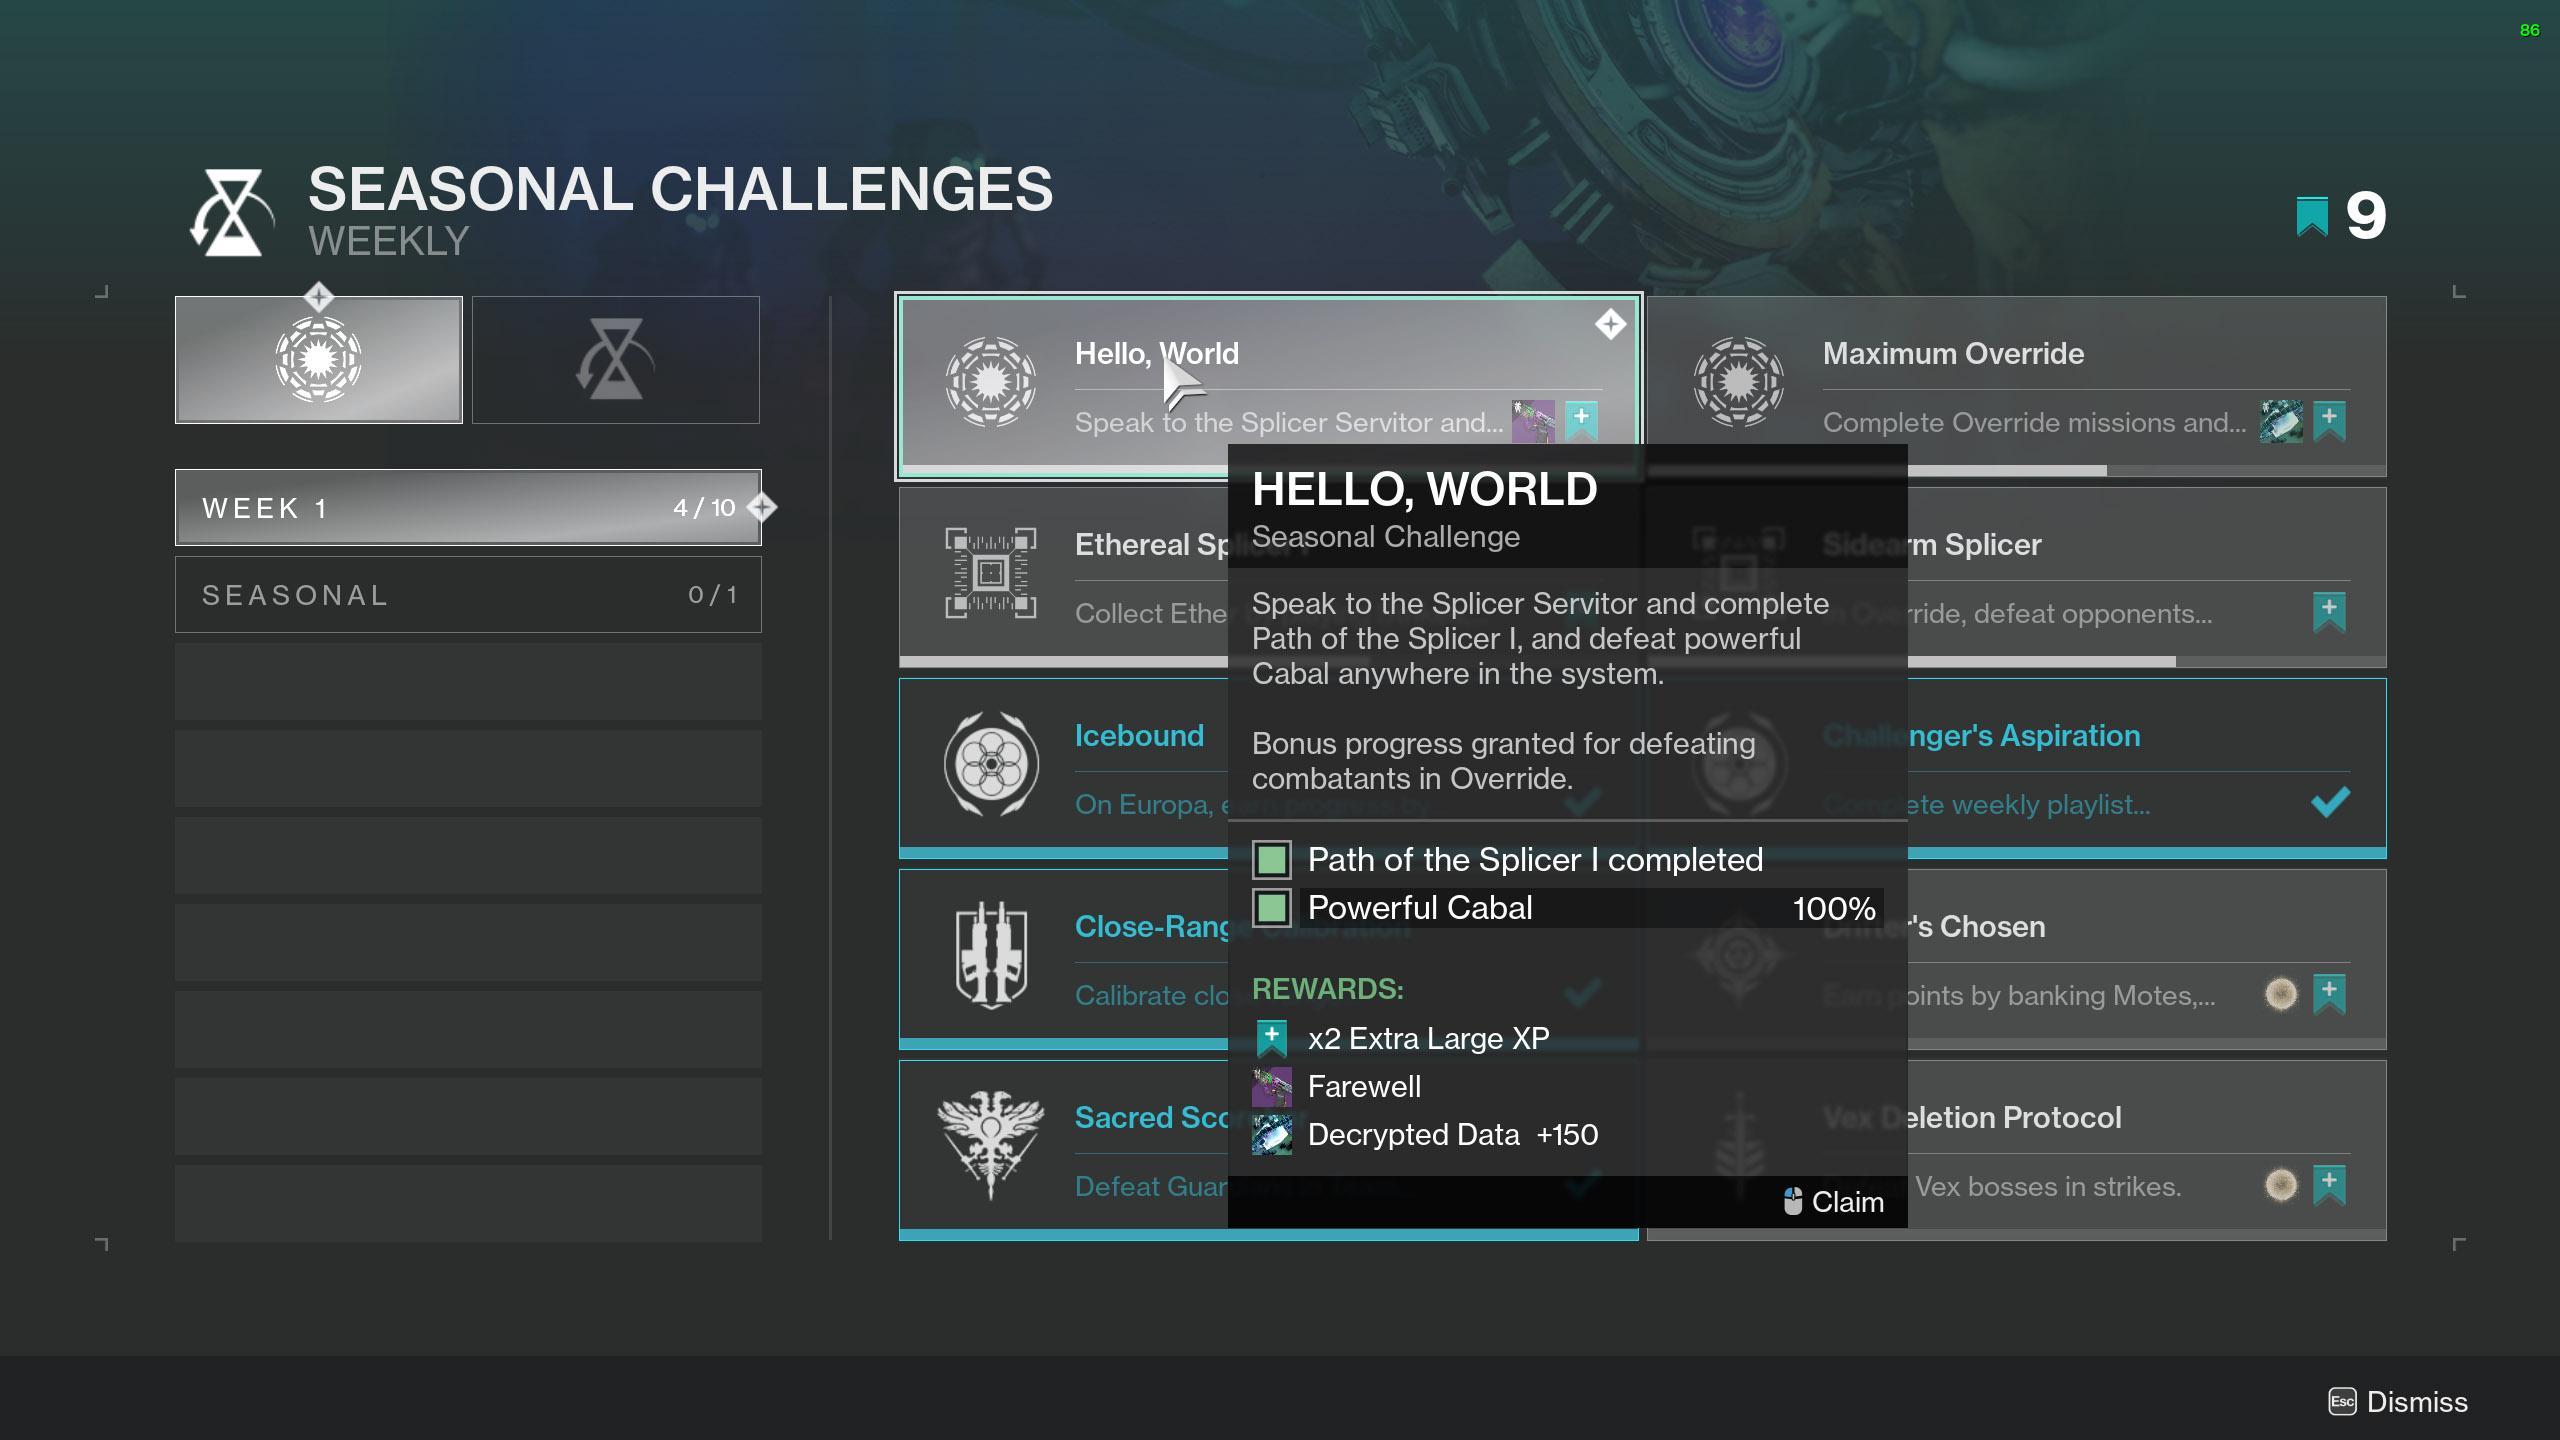 destiny 2 decrypted data seasonal challenges